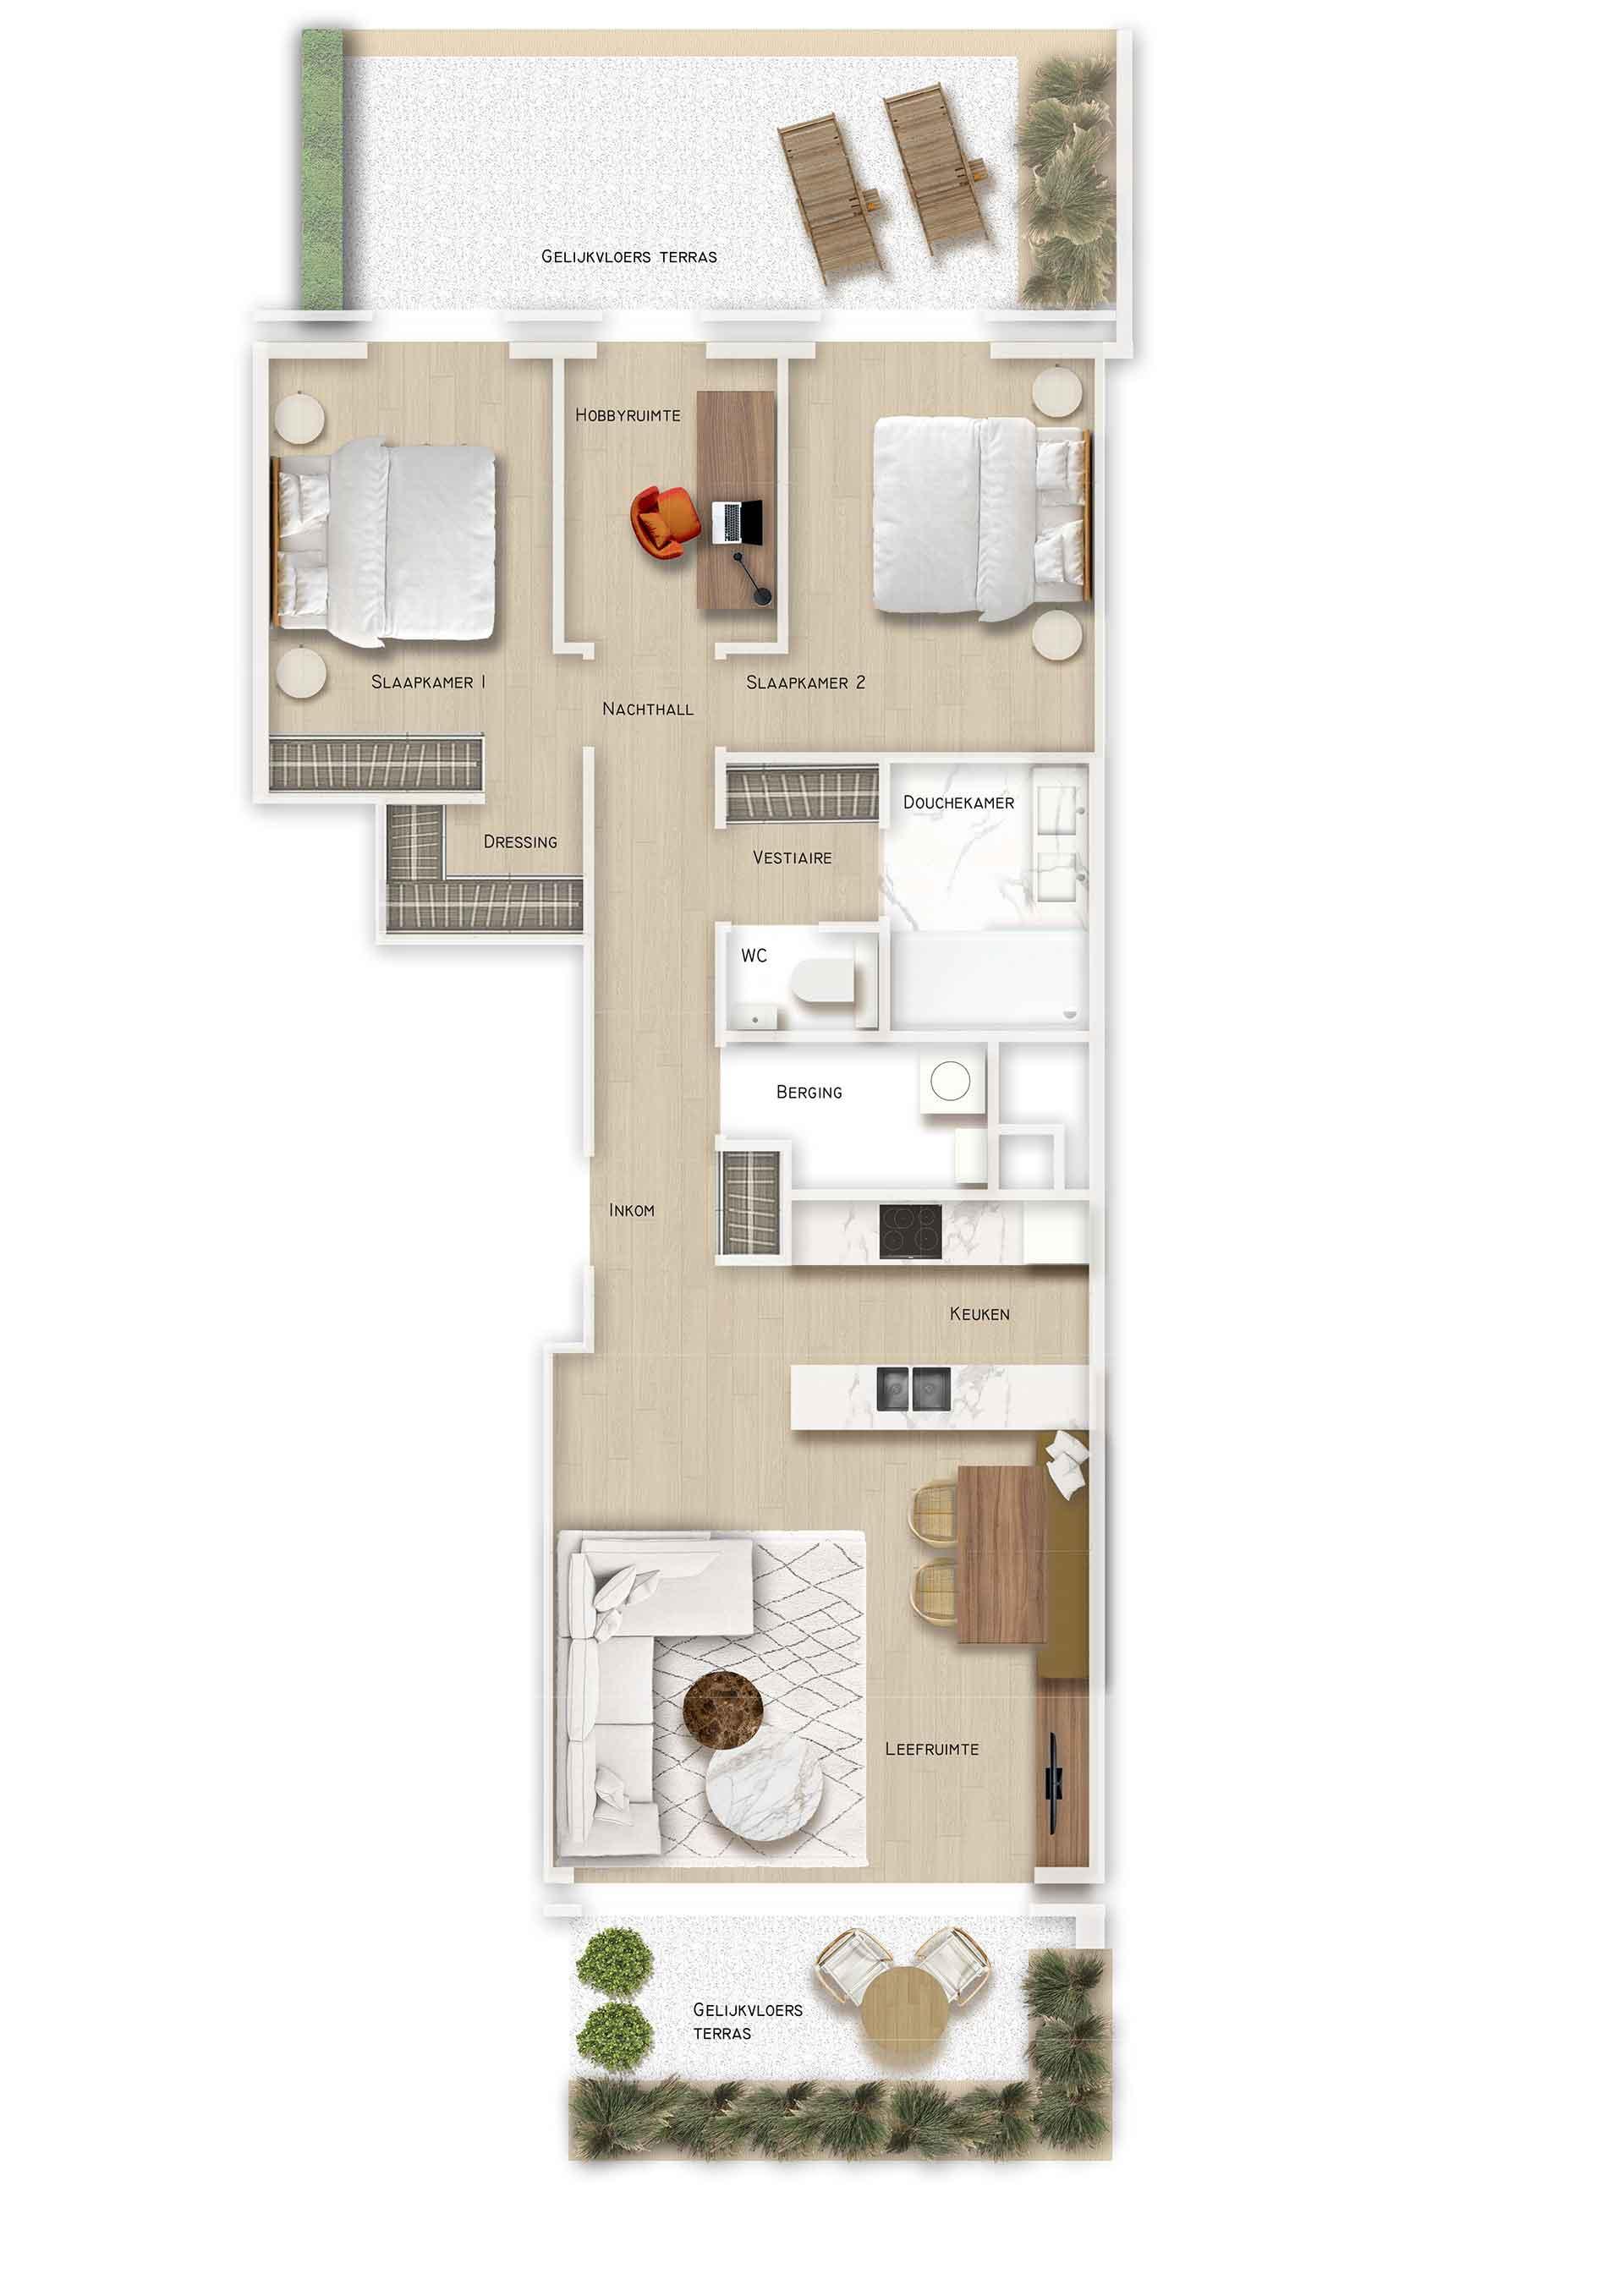 Residentie <br/> Ferrel - image appartement-te-koop-sint-idesbald-residentie-ferrel-appartement-gv02 on https://hoprom.be